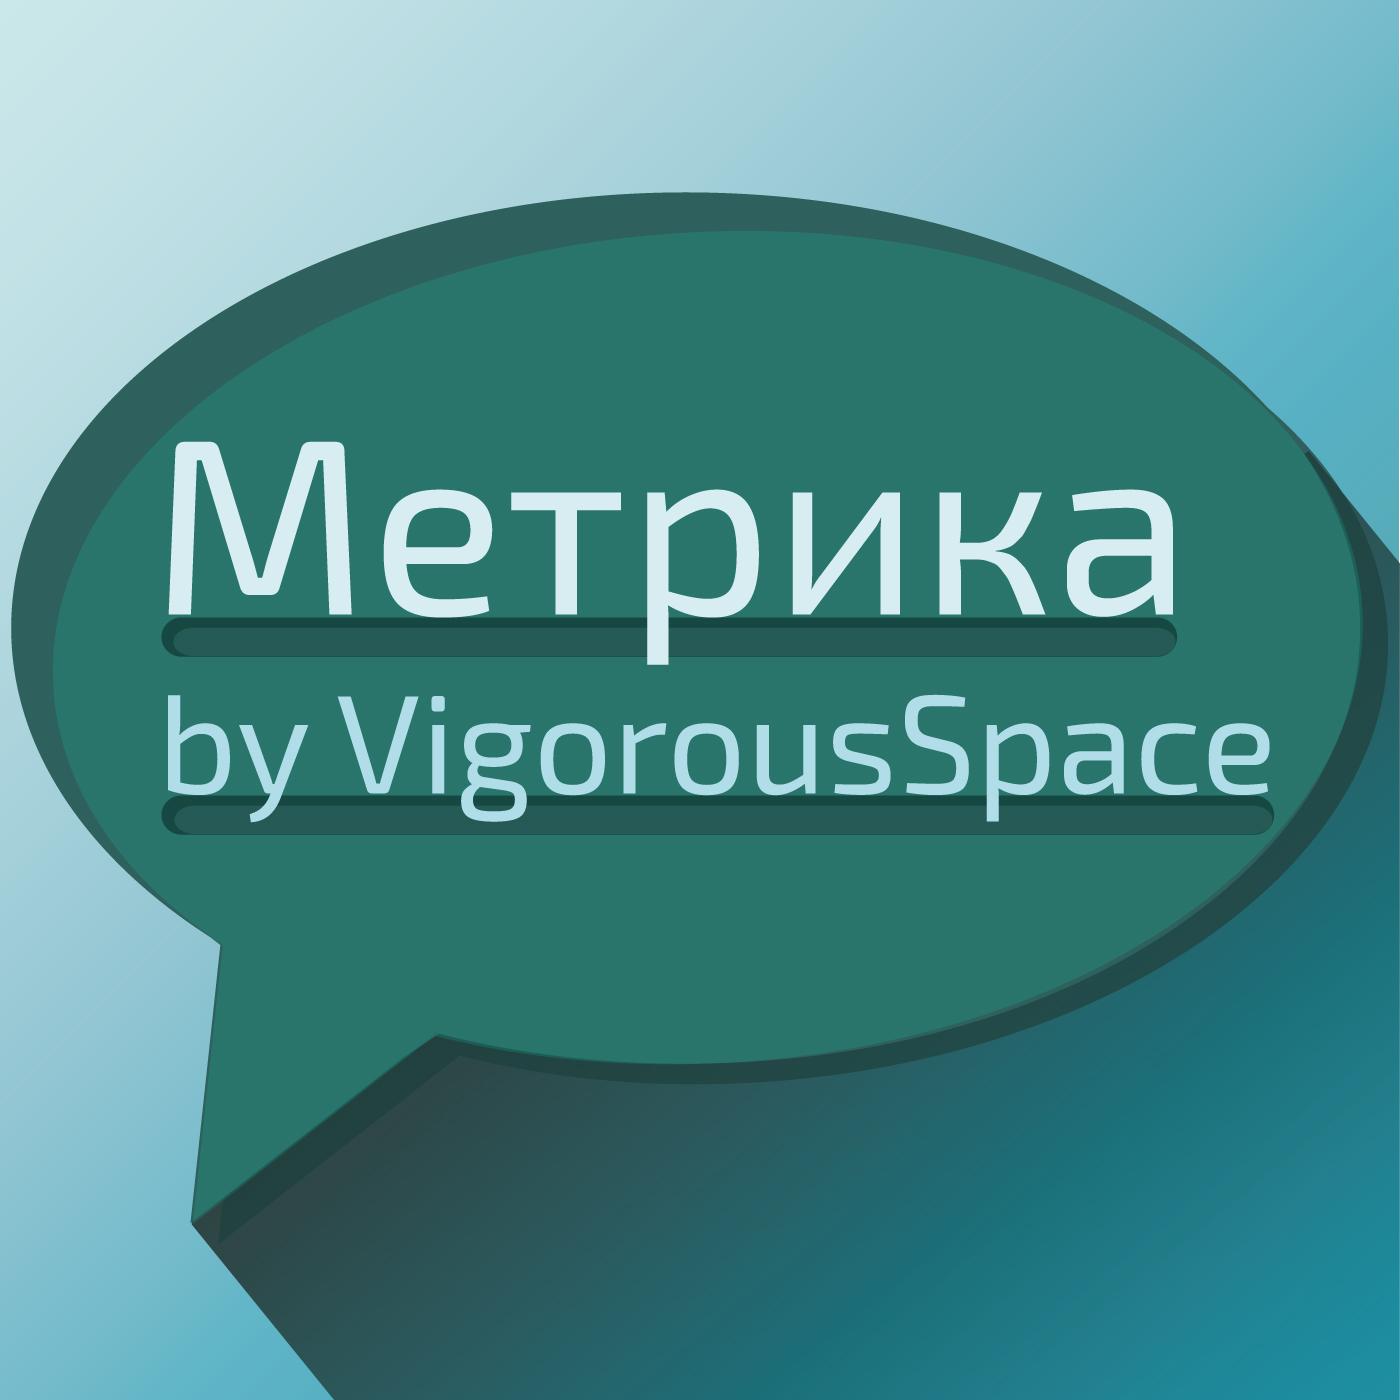 Metrica_by_vigorousspace